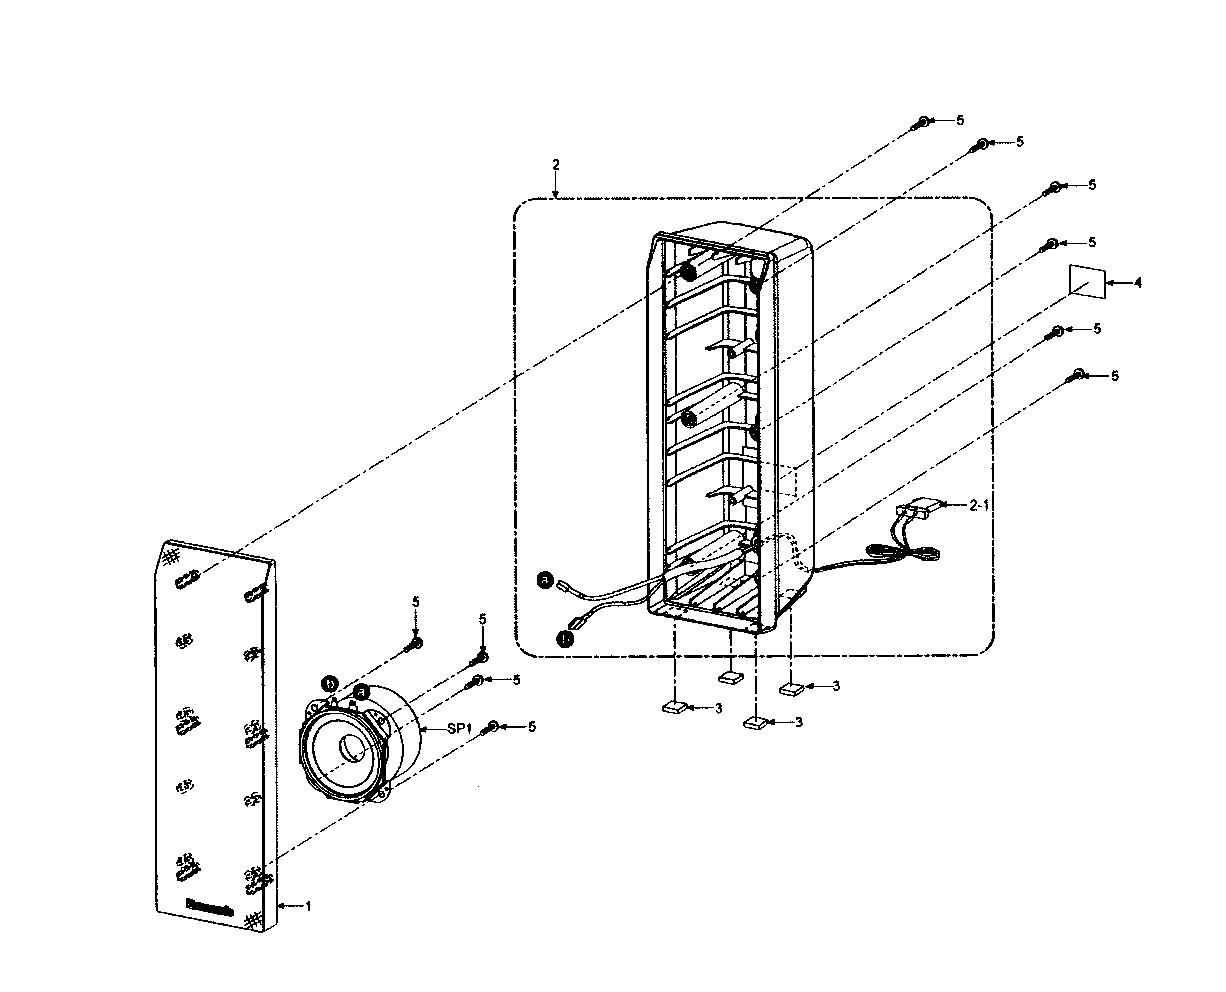 Panasonic model SC-PT660 home theatre genuine parts